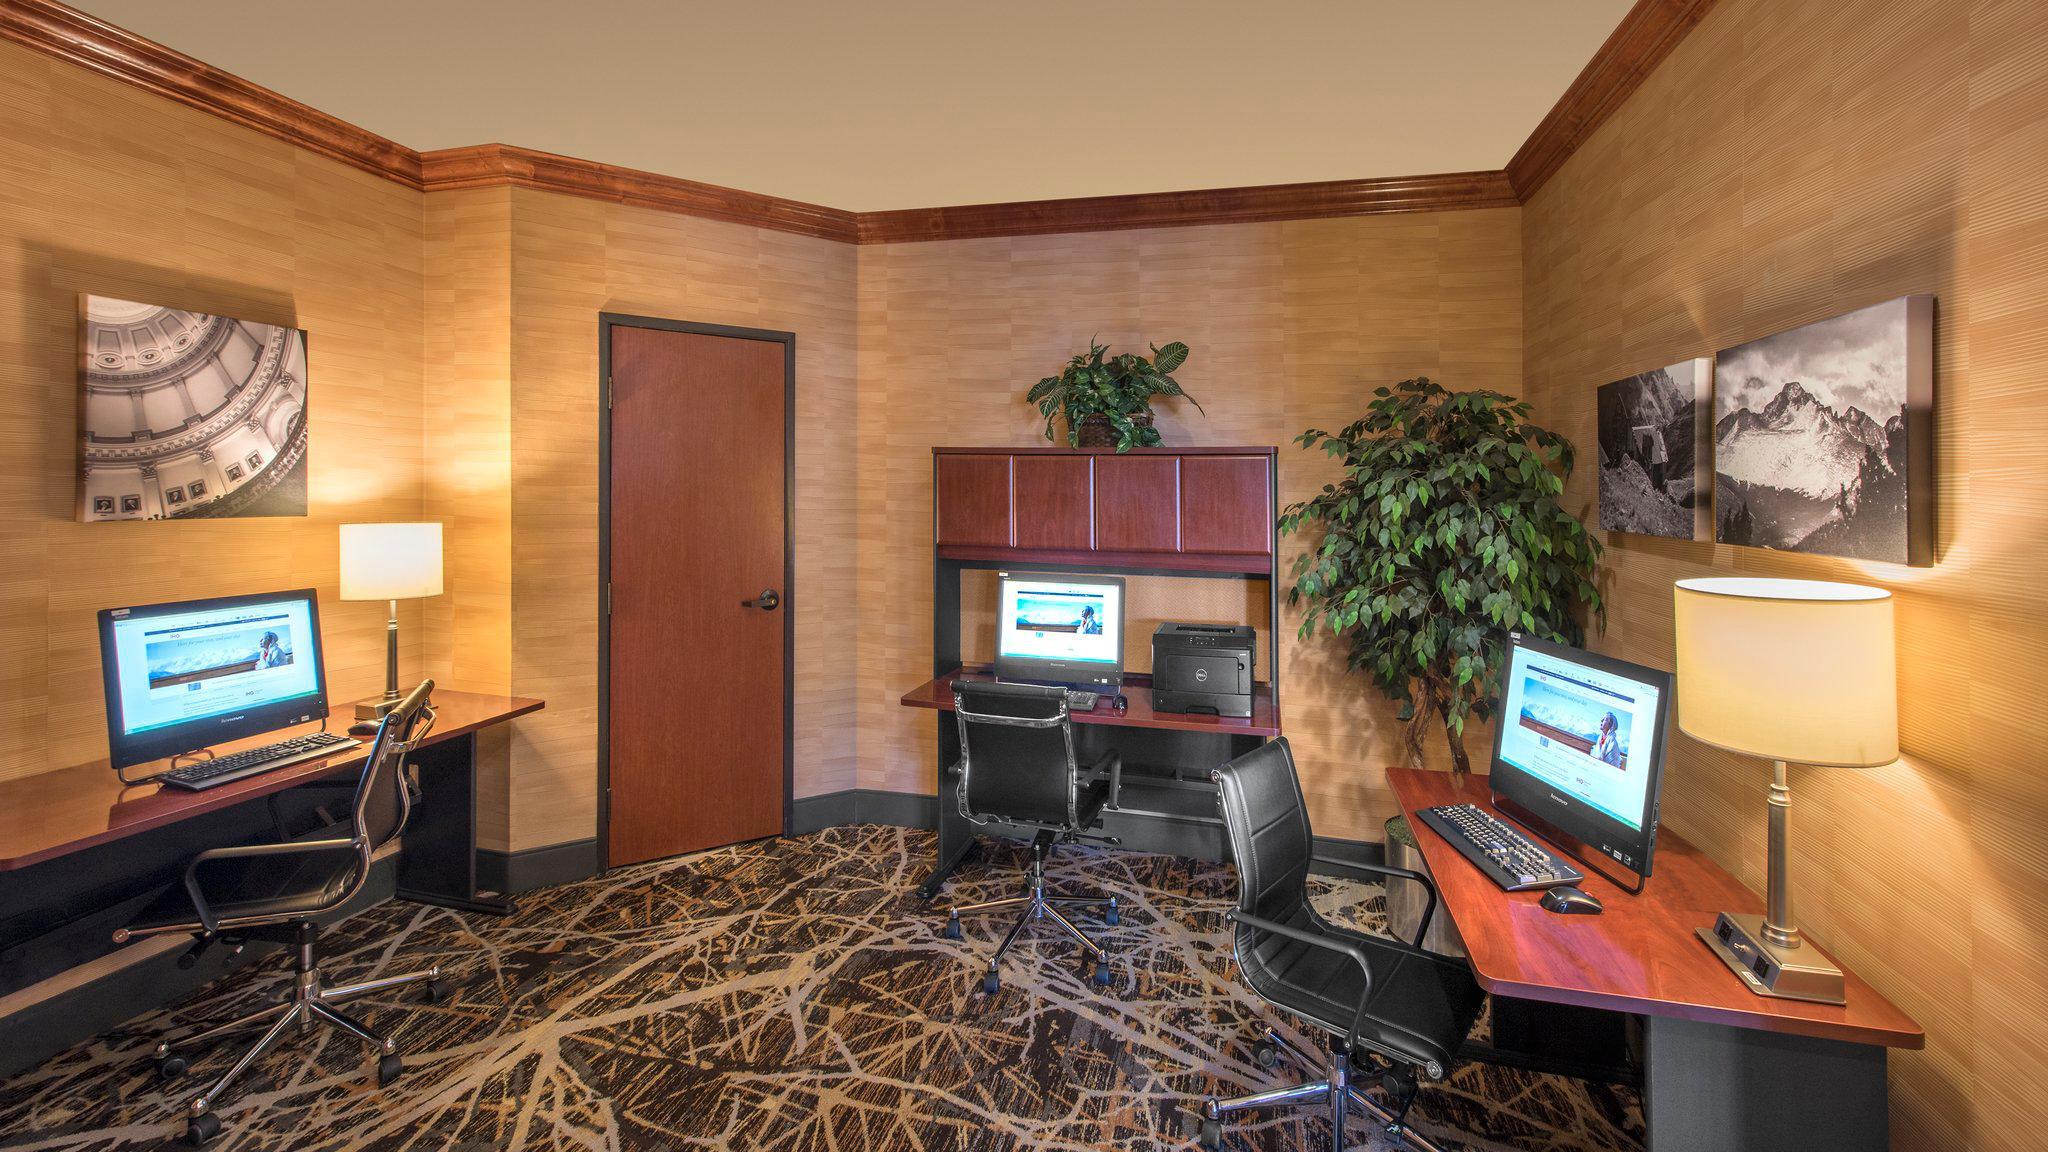 Holiday Inn Denver Lakewood, an IHG Hotel